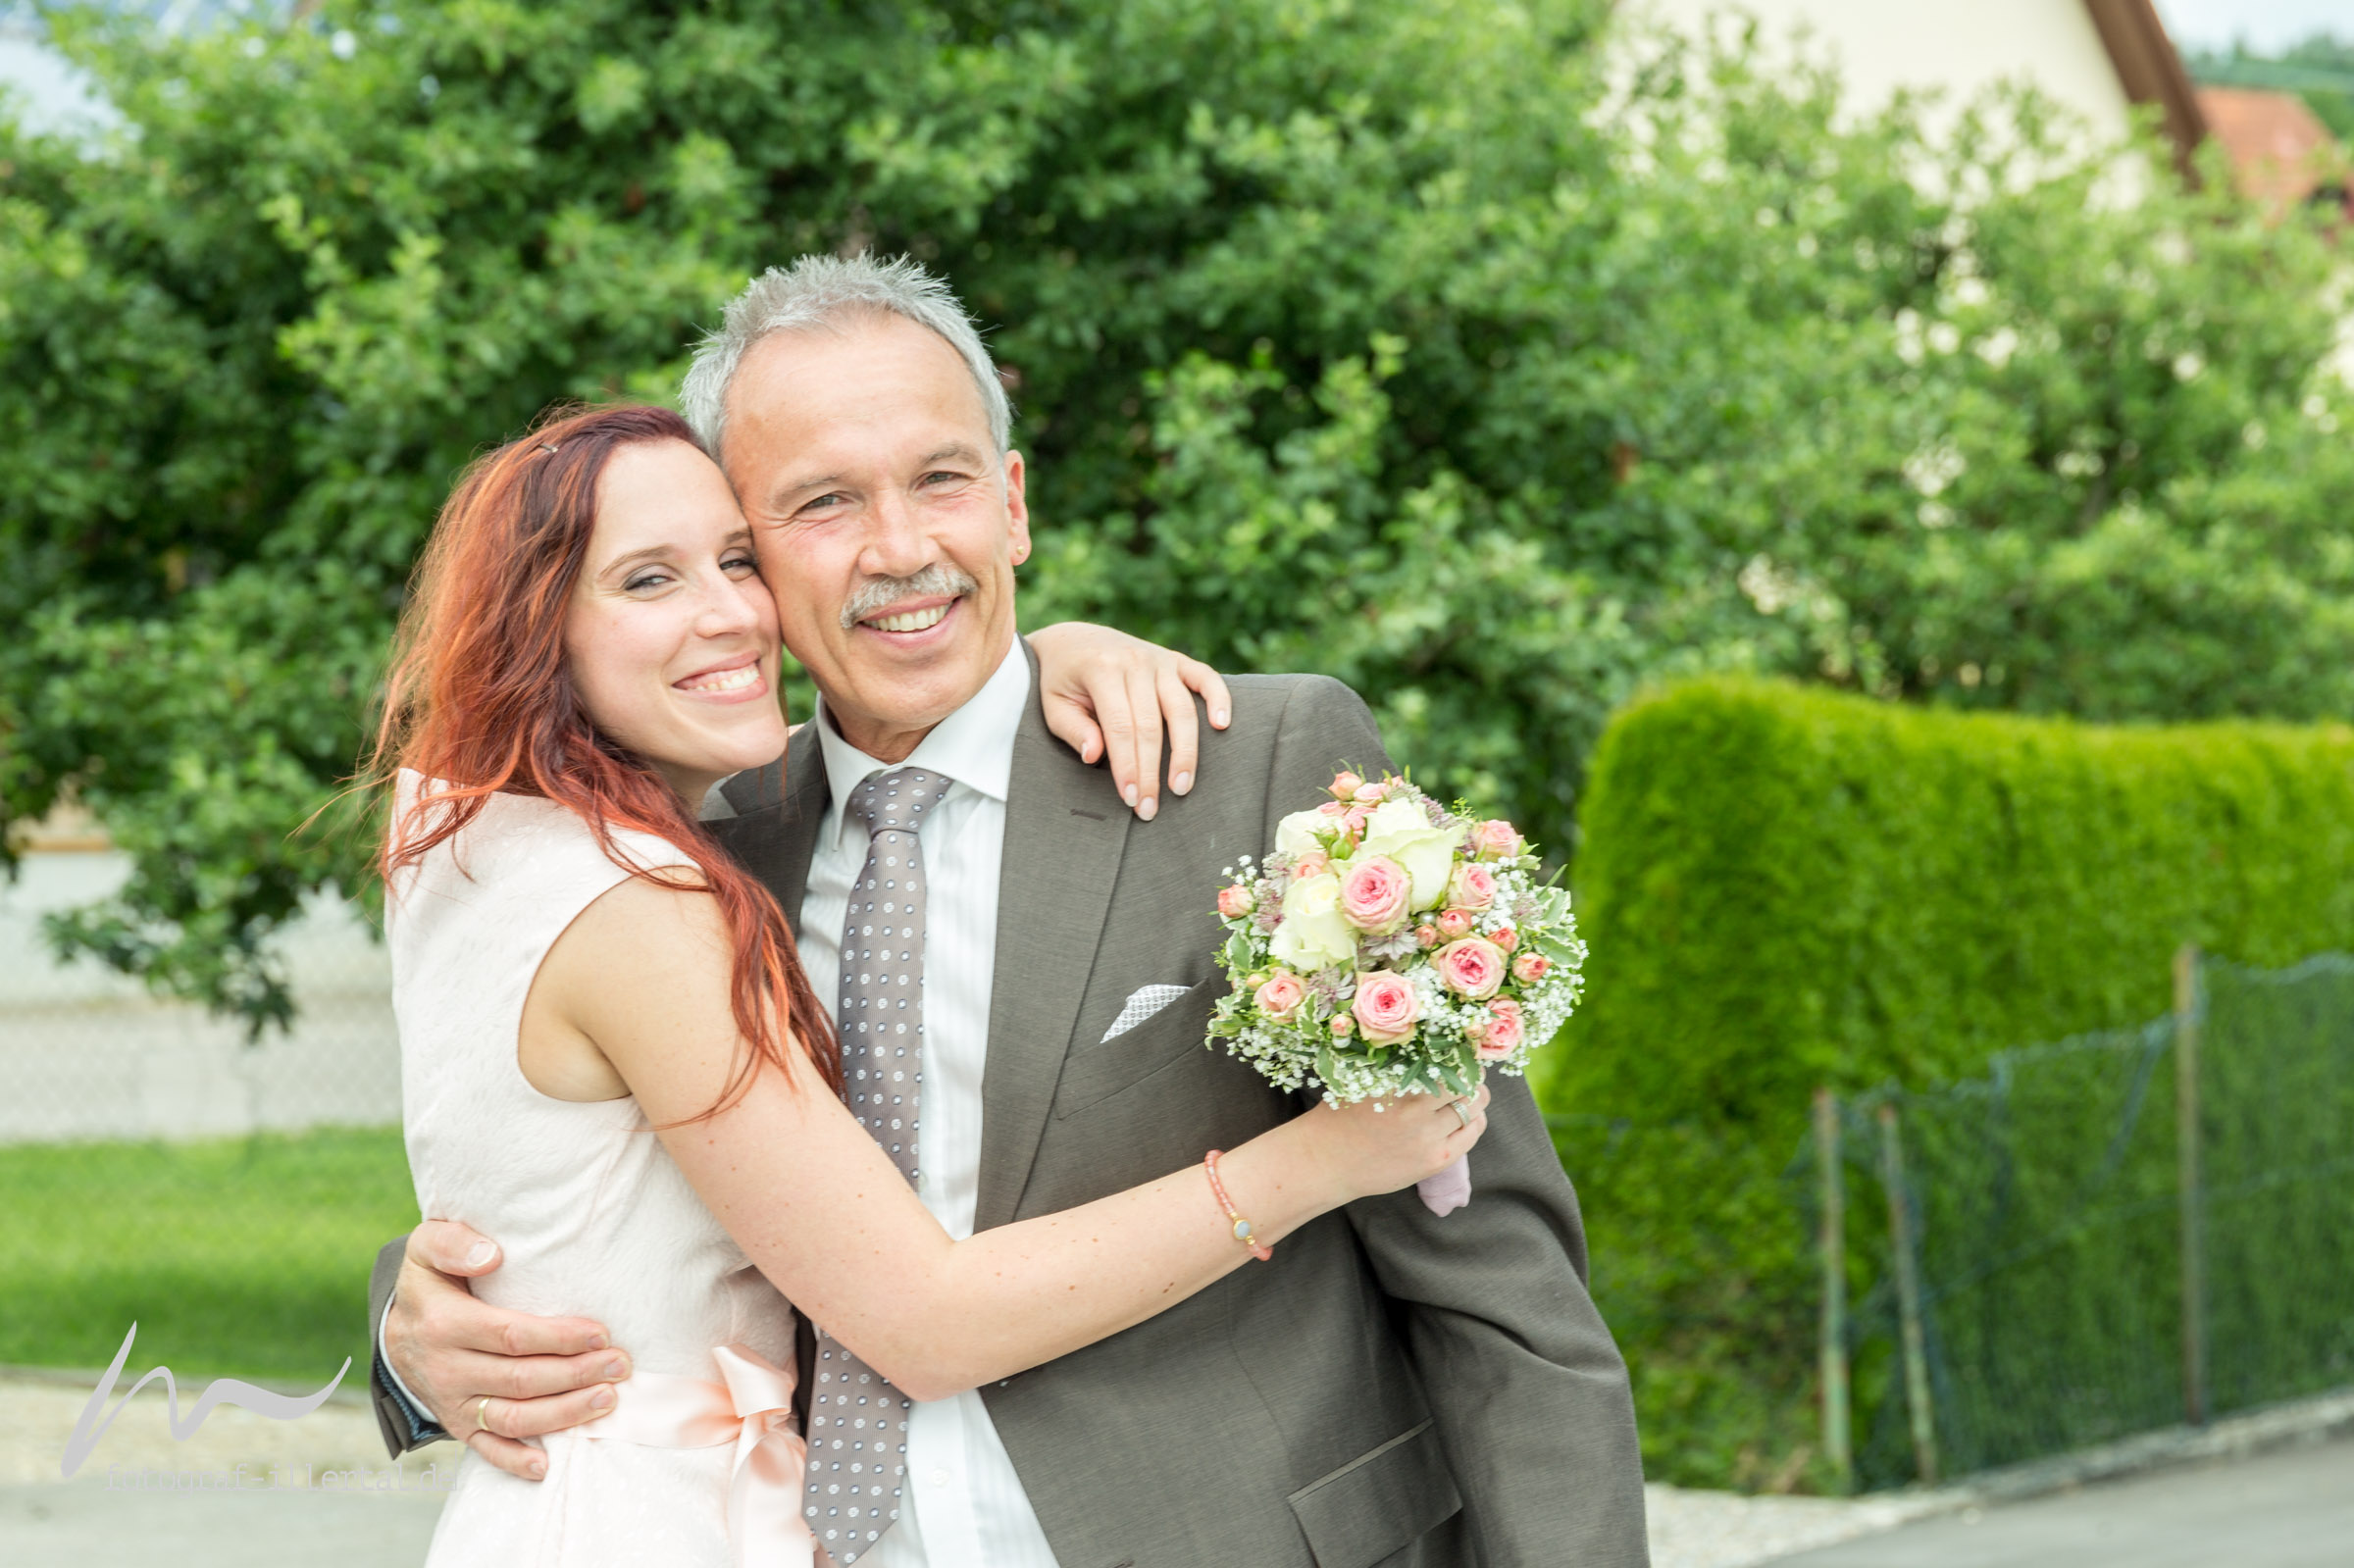 Fotograf Illertal-Christian Miller-Hochzeitsfotografie-_MG_1569